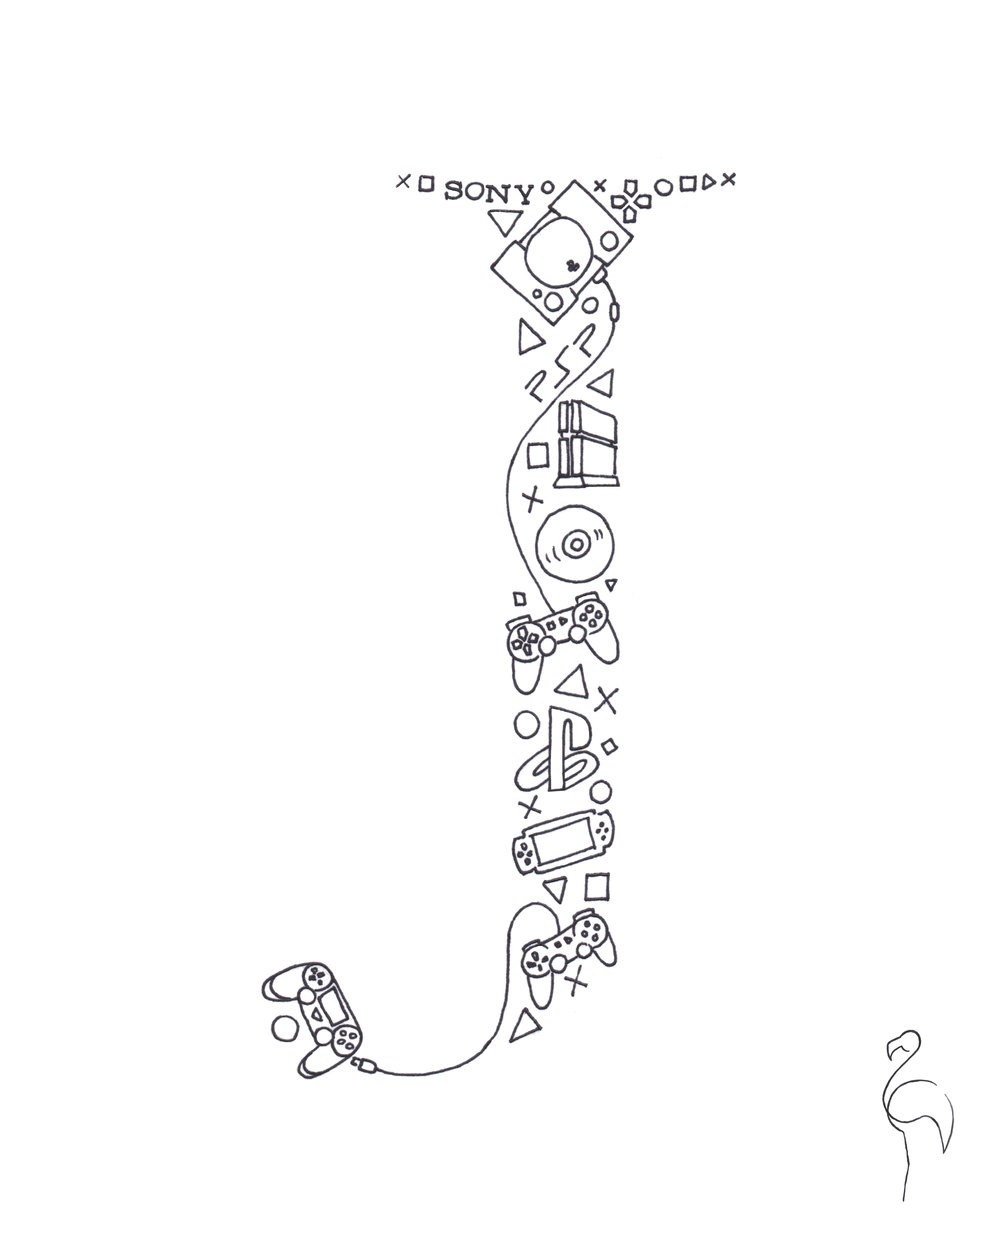 Brazzlebird - Letter J Drawing Sony Playstation.jpg